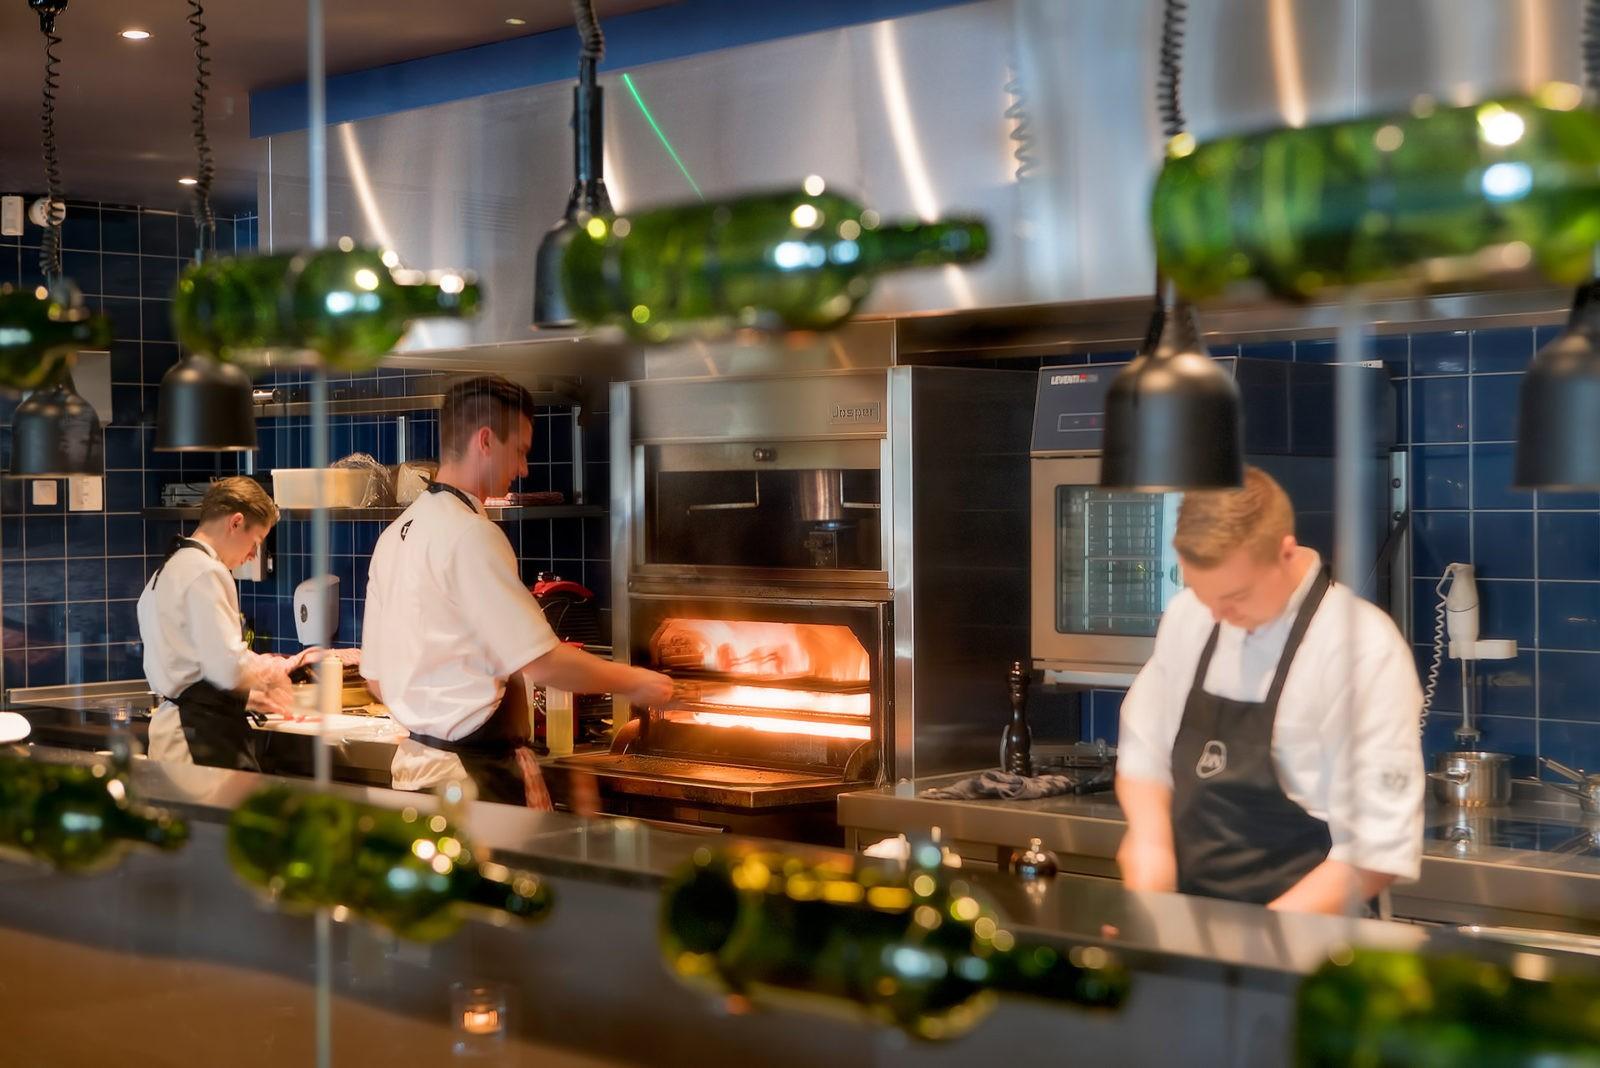 Grand Cafe Du Nord Kaatsheuvel keuken Josper